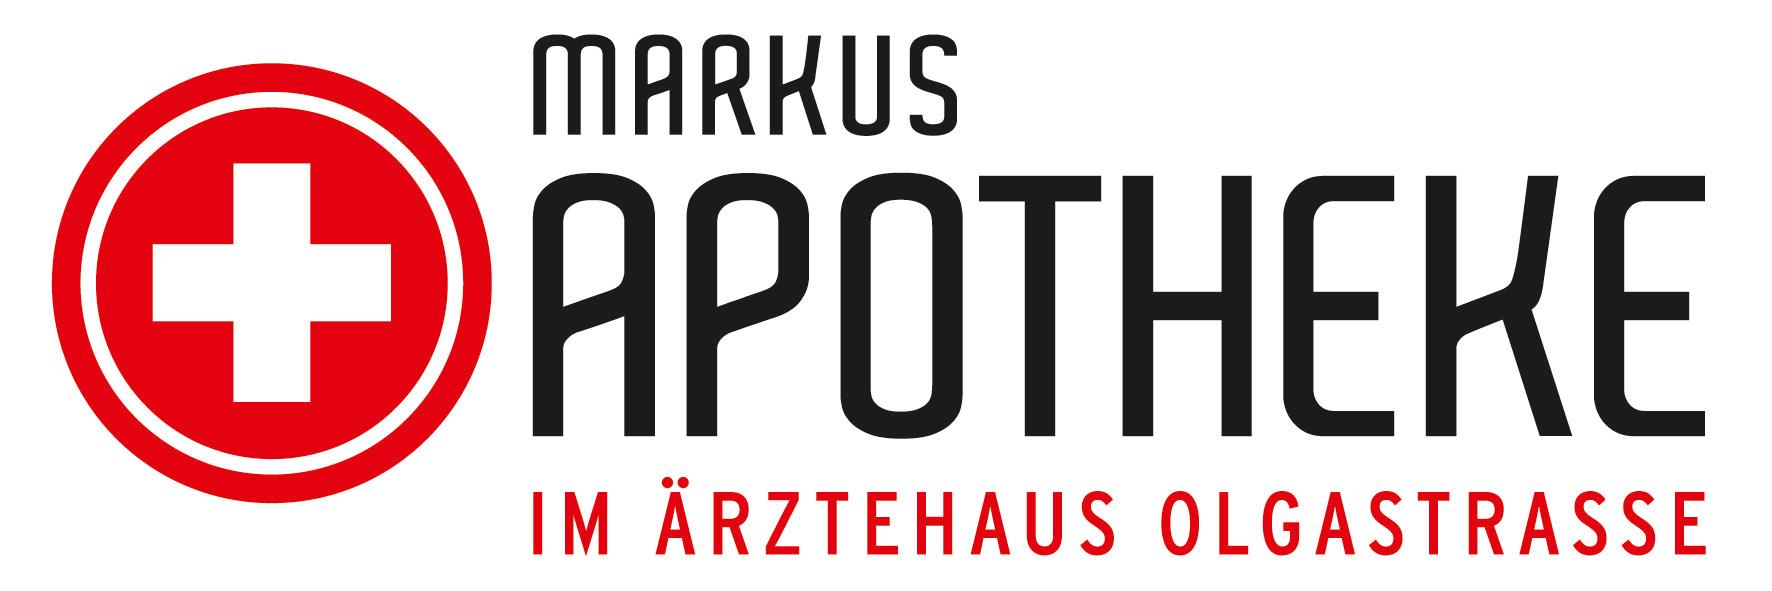 Logo der Markus-Apotheke